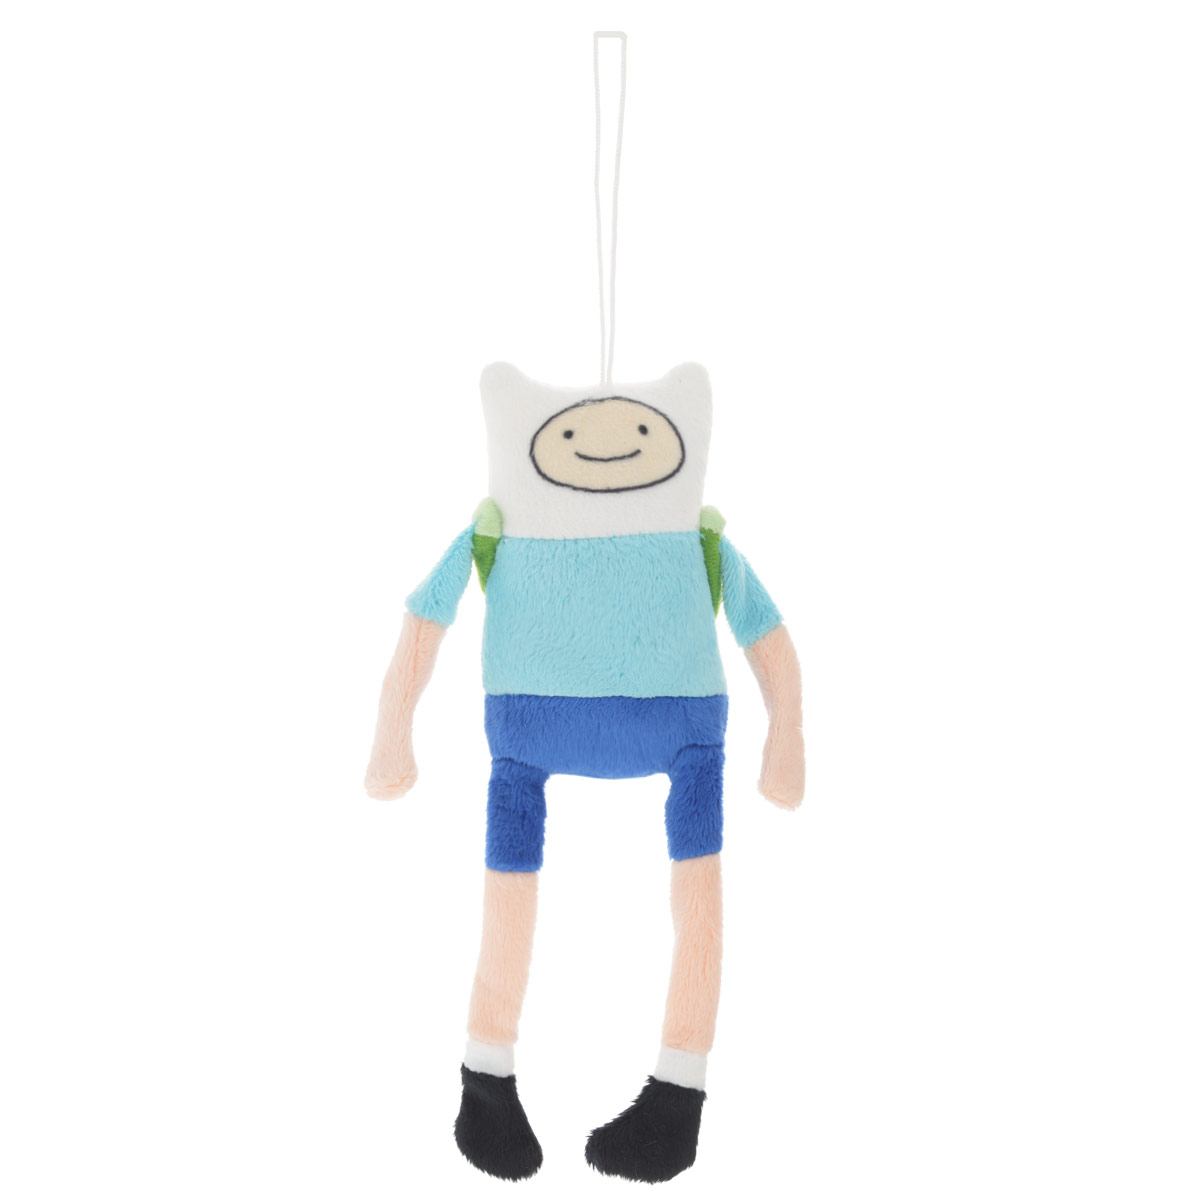 Мягкая игрушка Adventure Time FABU0 голубой adventure time магнитола boombox время приключений